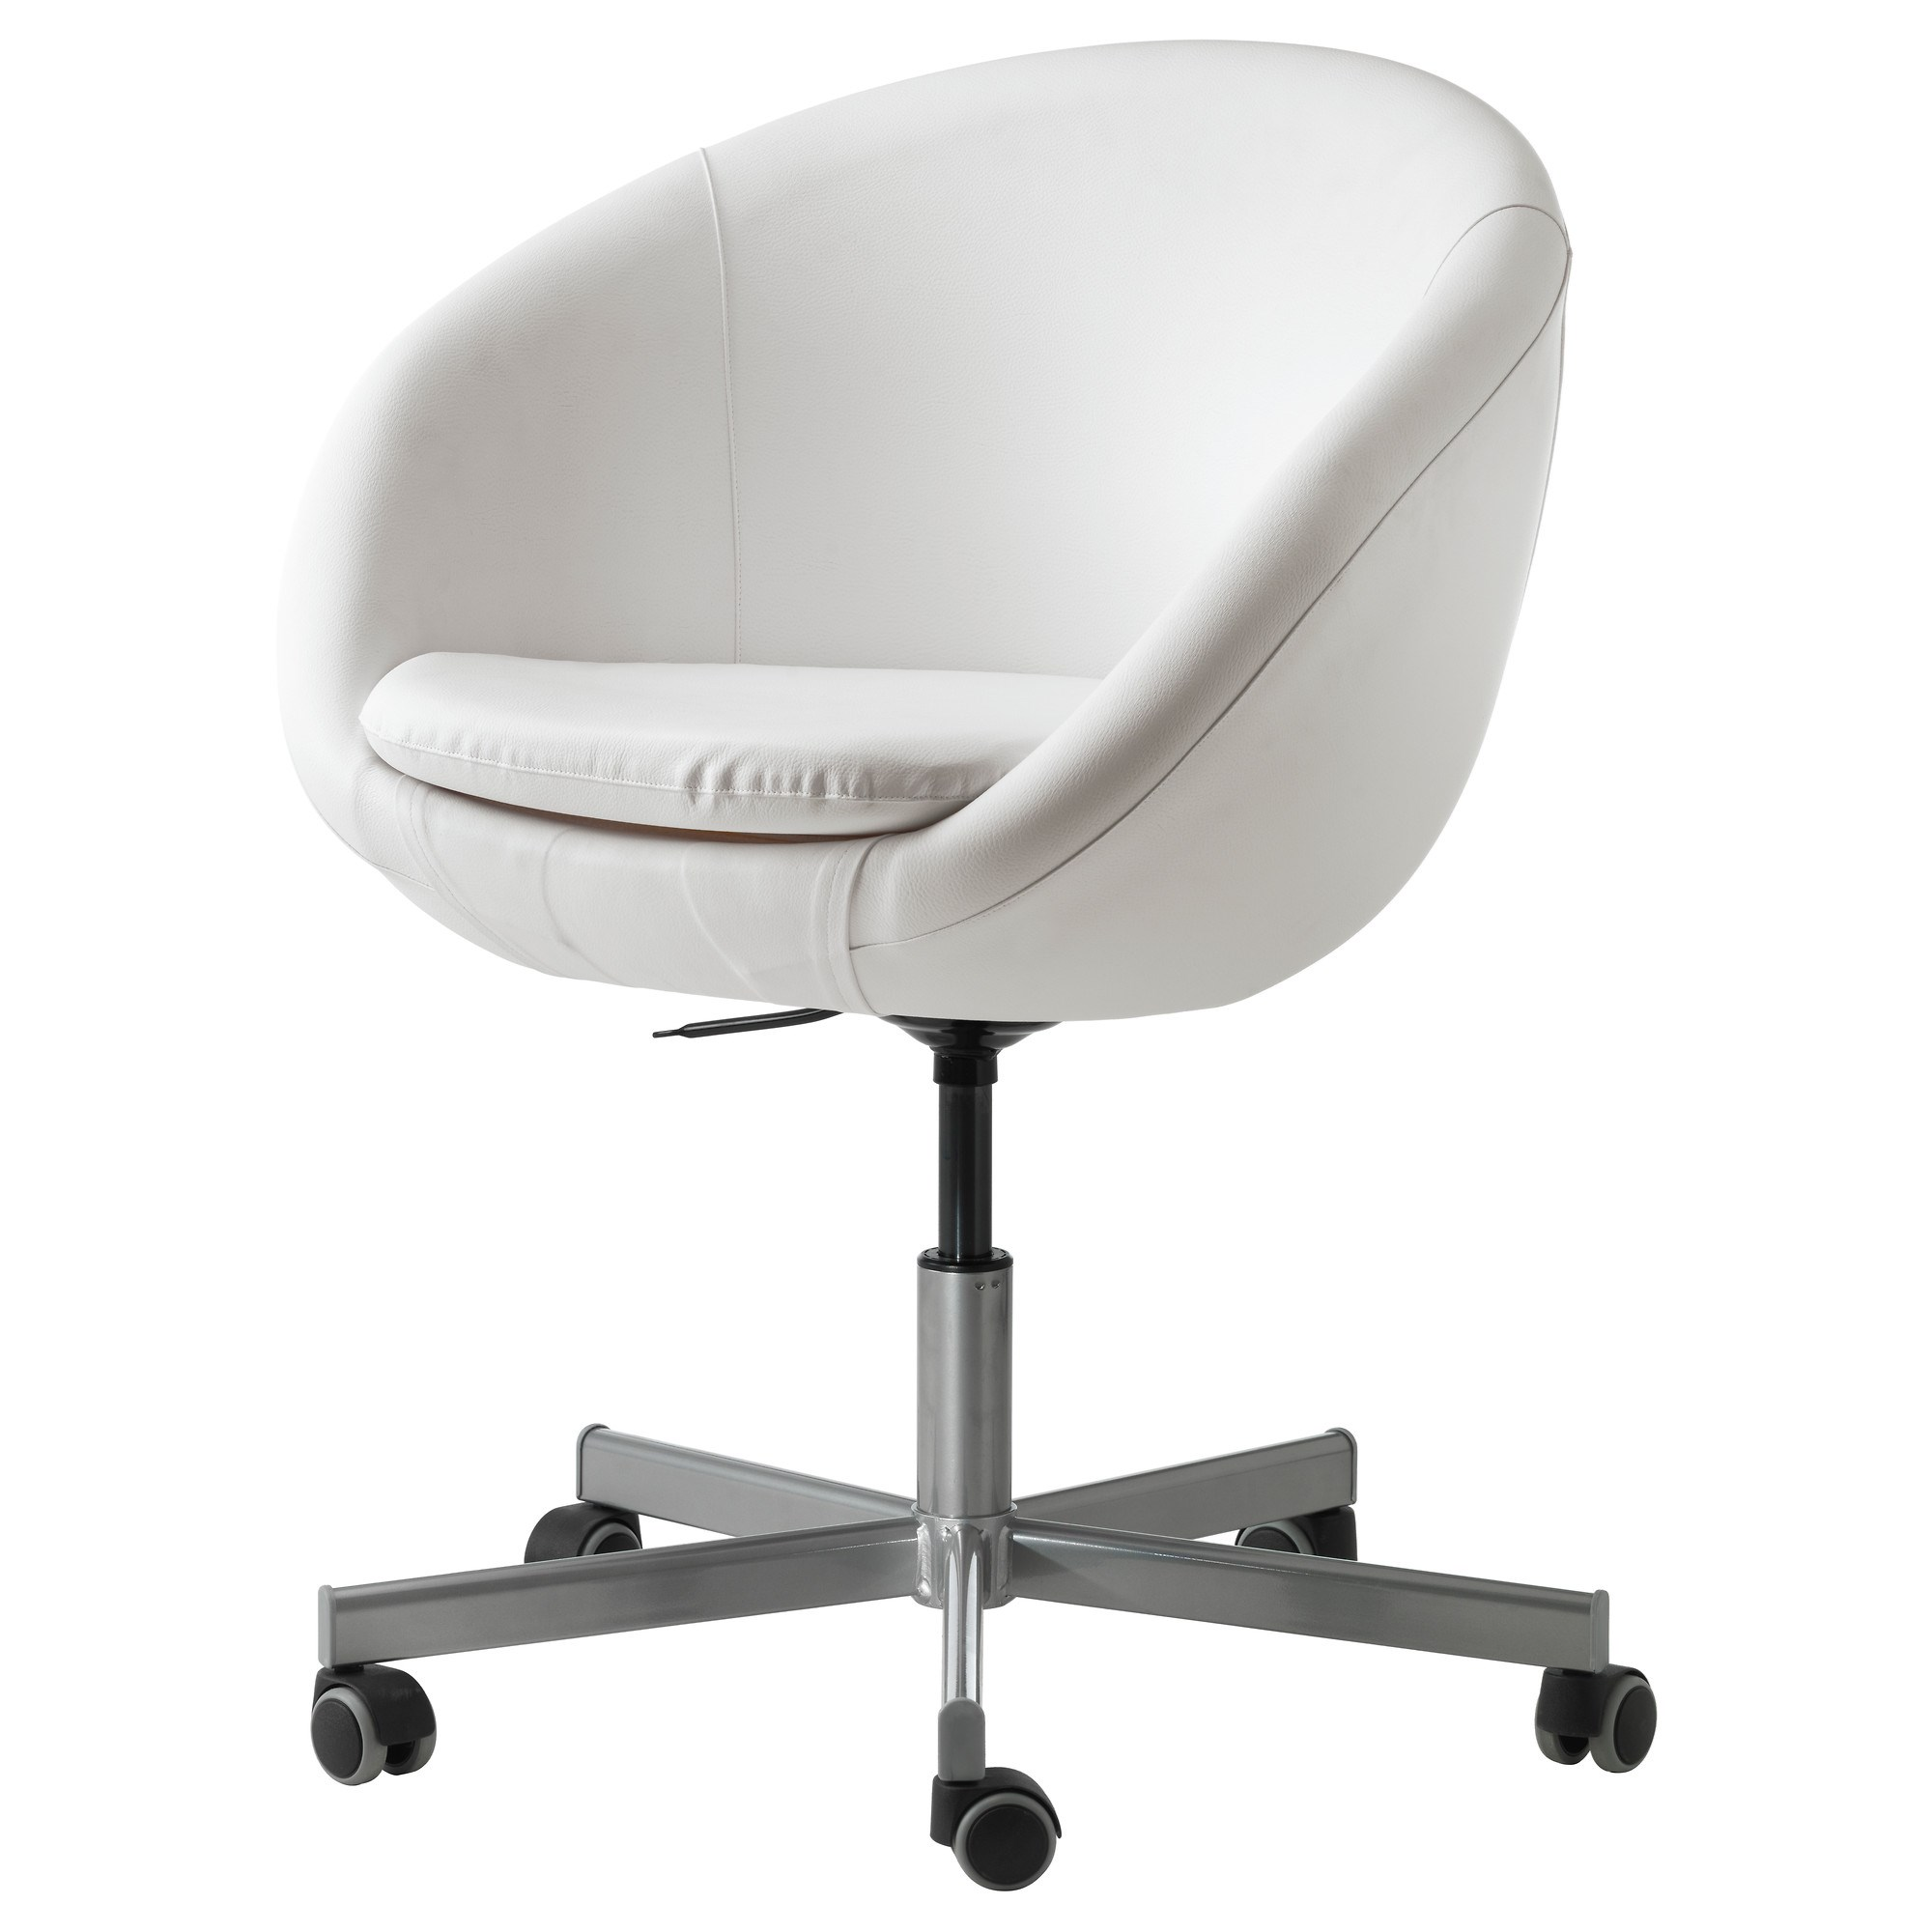 ikea design armchair swivel ideas with for stainless steel legs unique gray bag chair foam toddler inspiring cheap egg bean